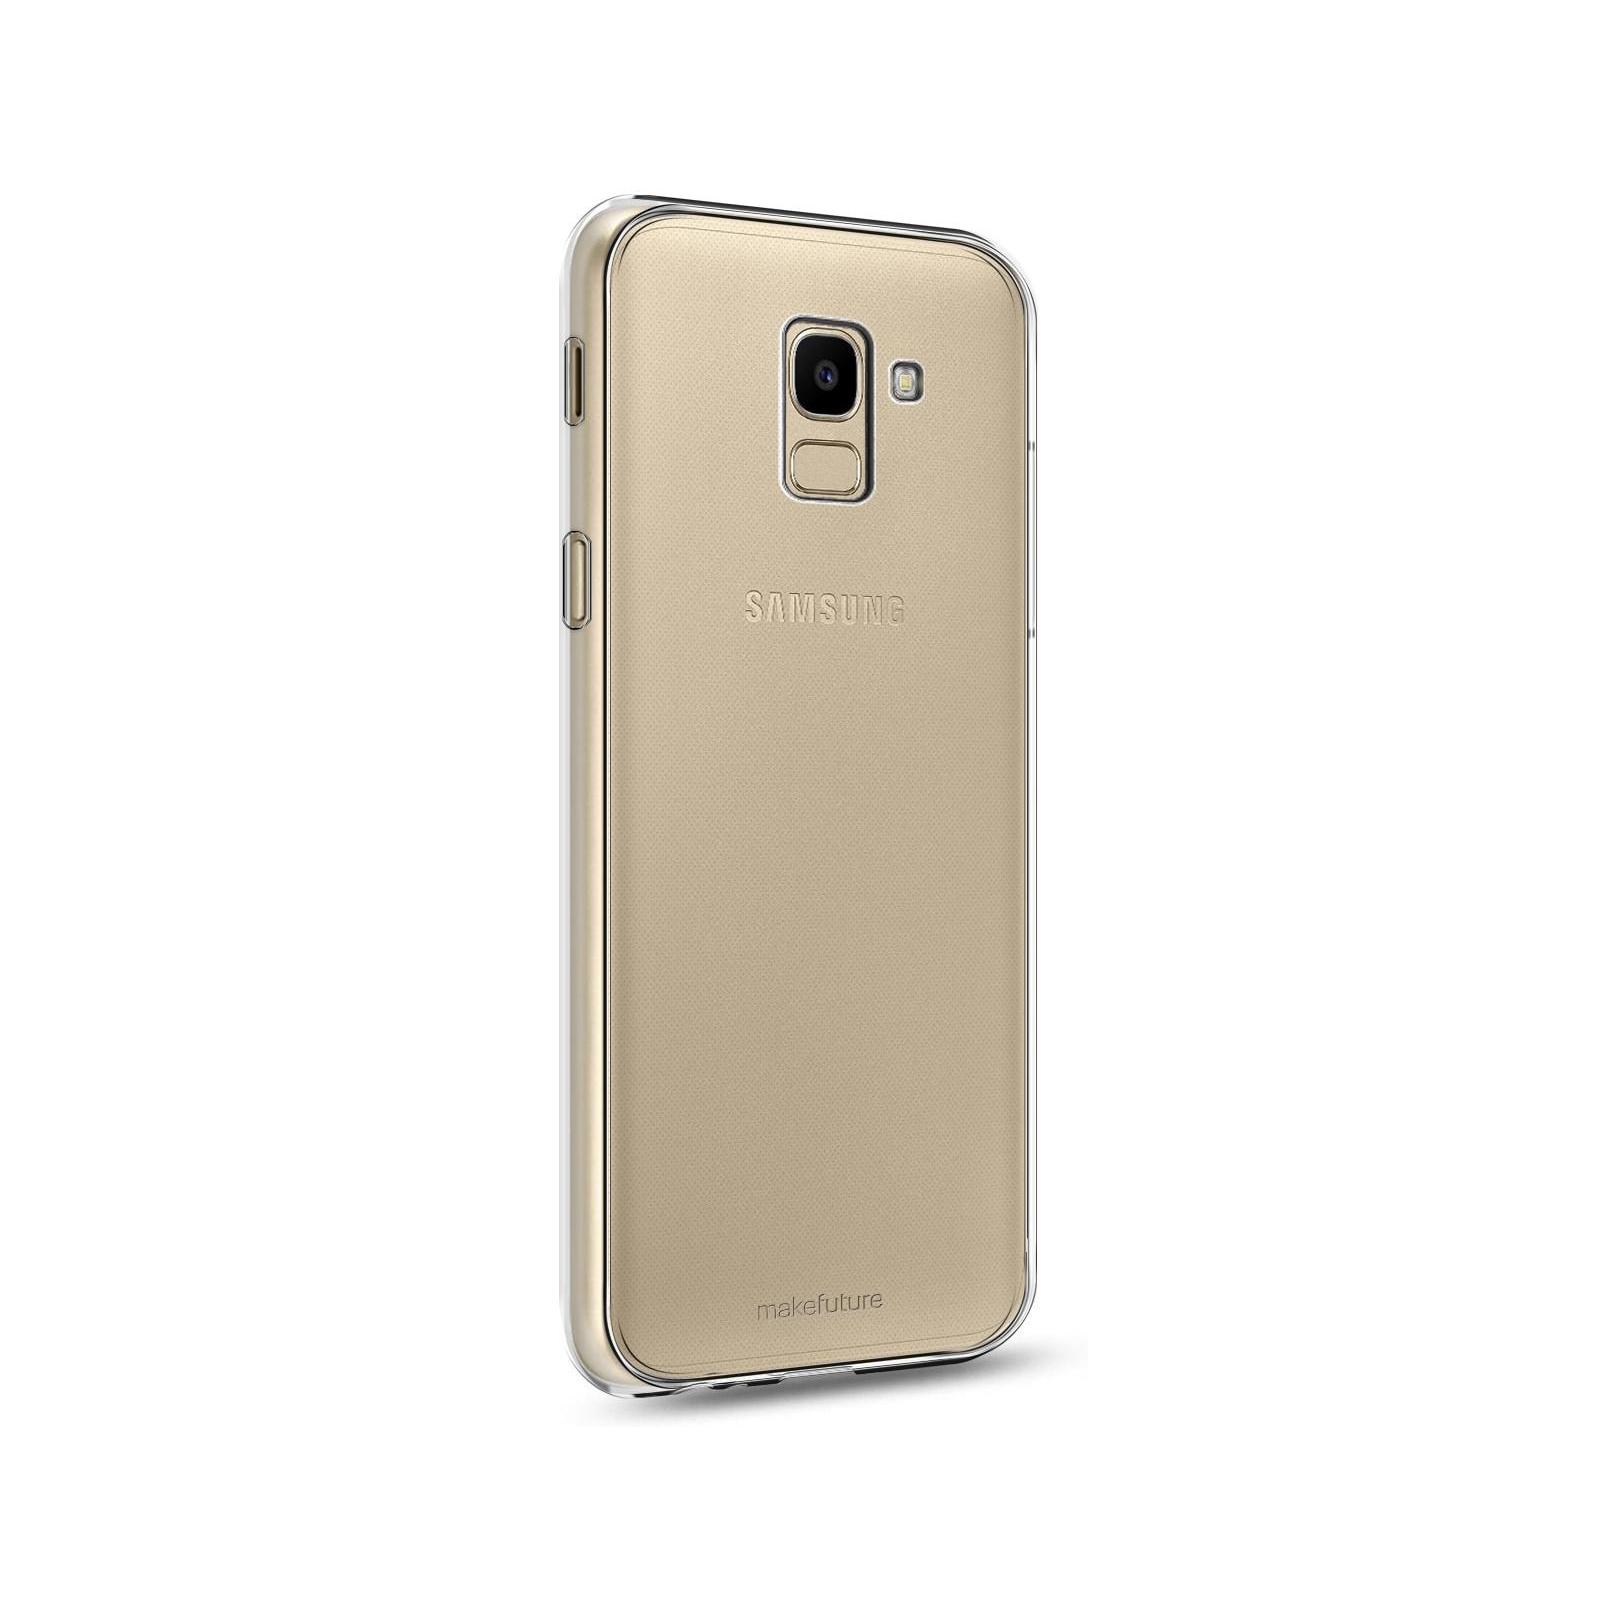 Чехол для моб. телефона MakeFuture Air Case (TPU) Samsung J6 2018 Clear (MCA-SJ618CL) изображение 2